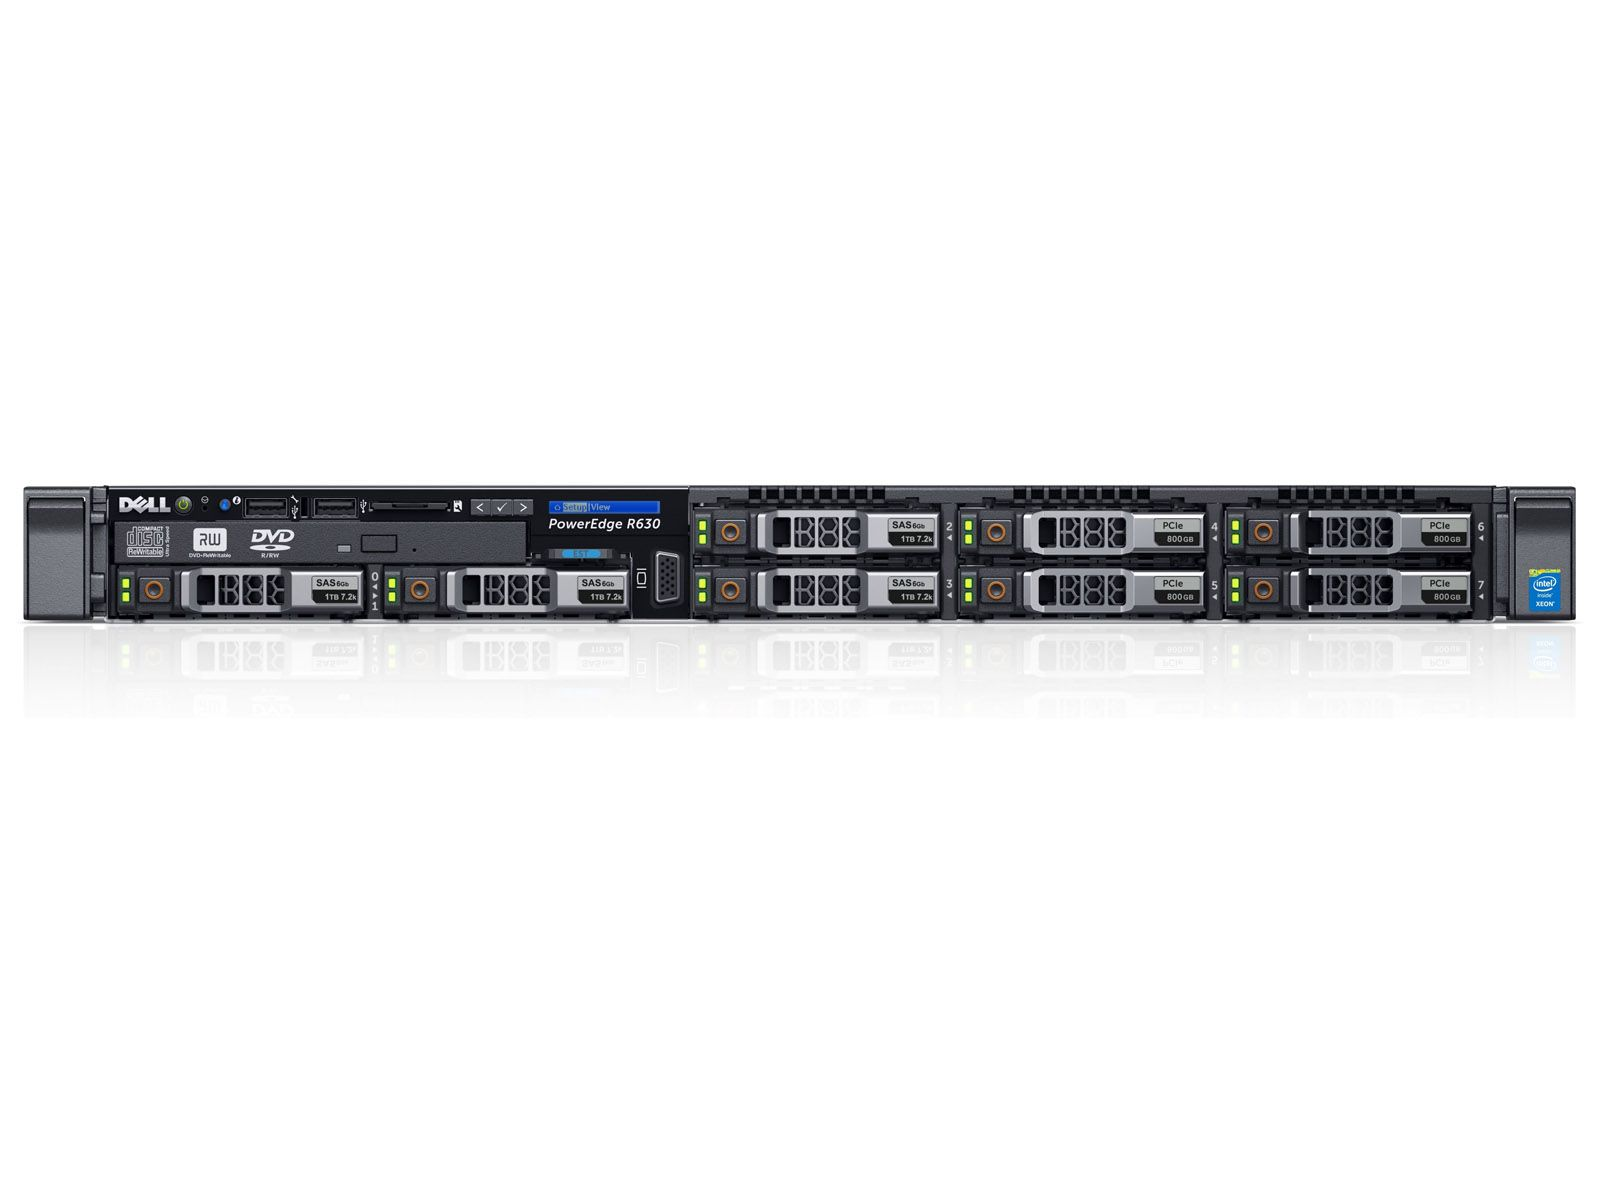 "PowerEdge R630 Dell сервер 2 Xeon® E5-2600 v3 (без CPU), без (MEM, HDD 8x 2.5"", PERC, БП) DVD"